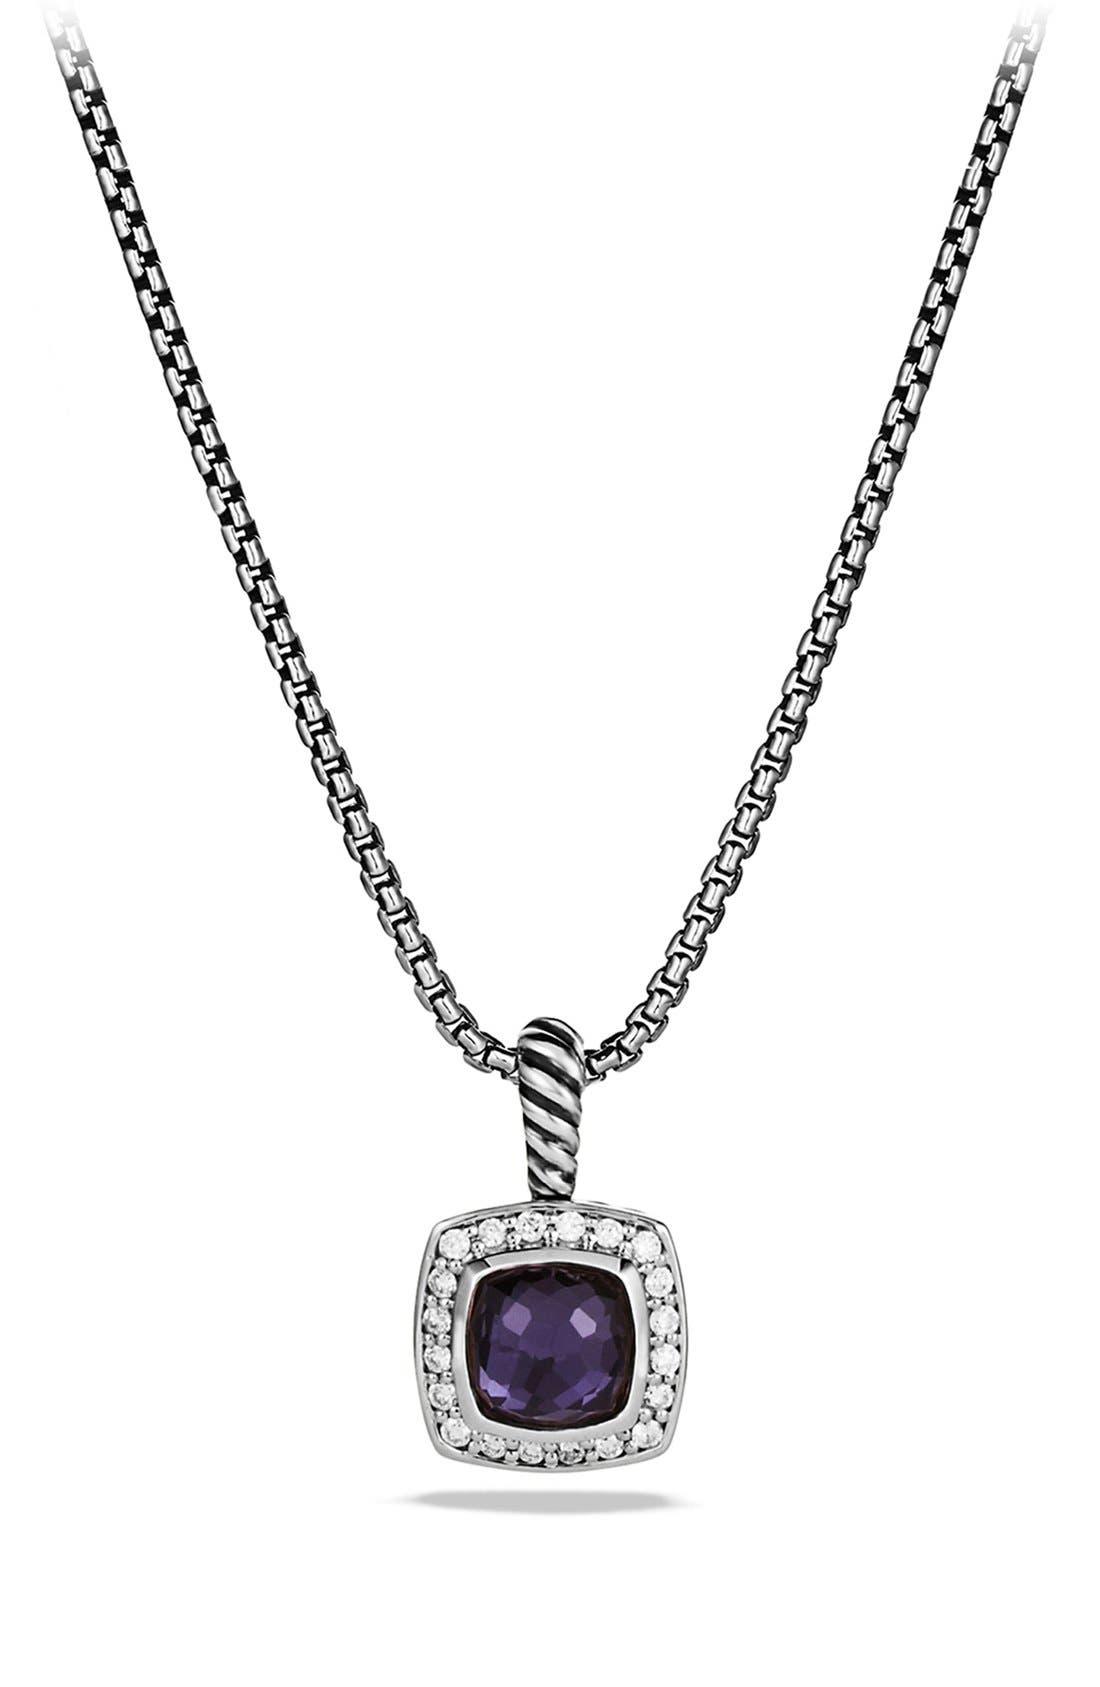 'Albion' Petite Pendant with Semiprecious Stone & Diamonds on Chain,                         Main,                         color, Black Orchid